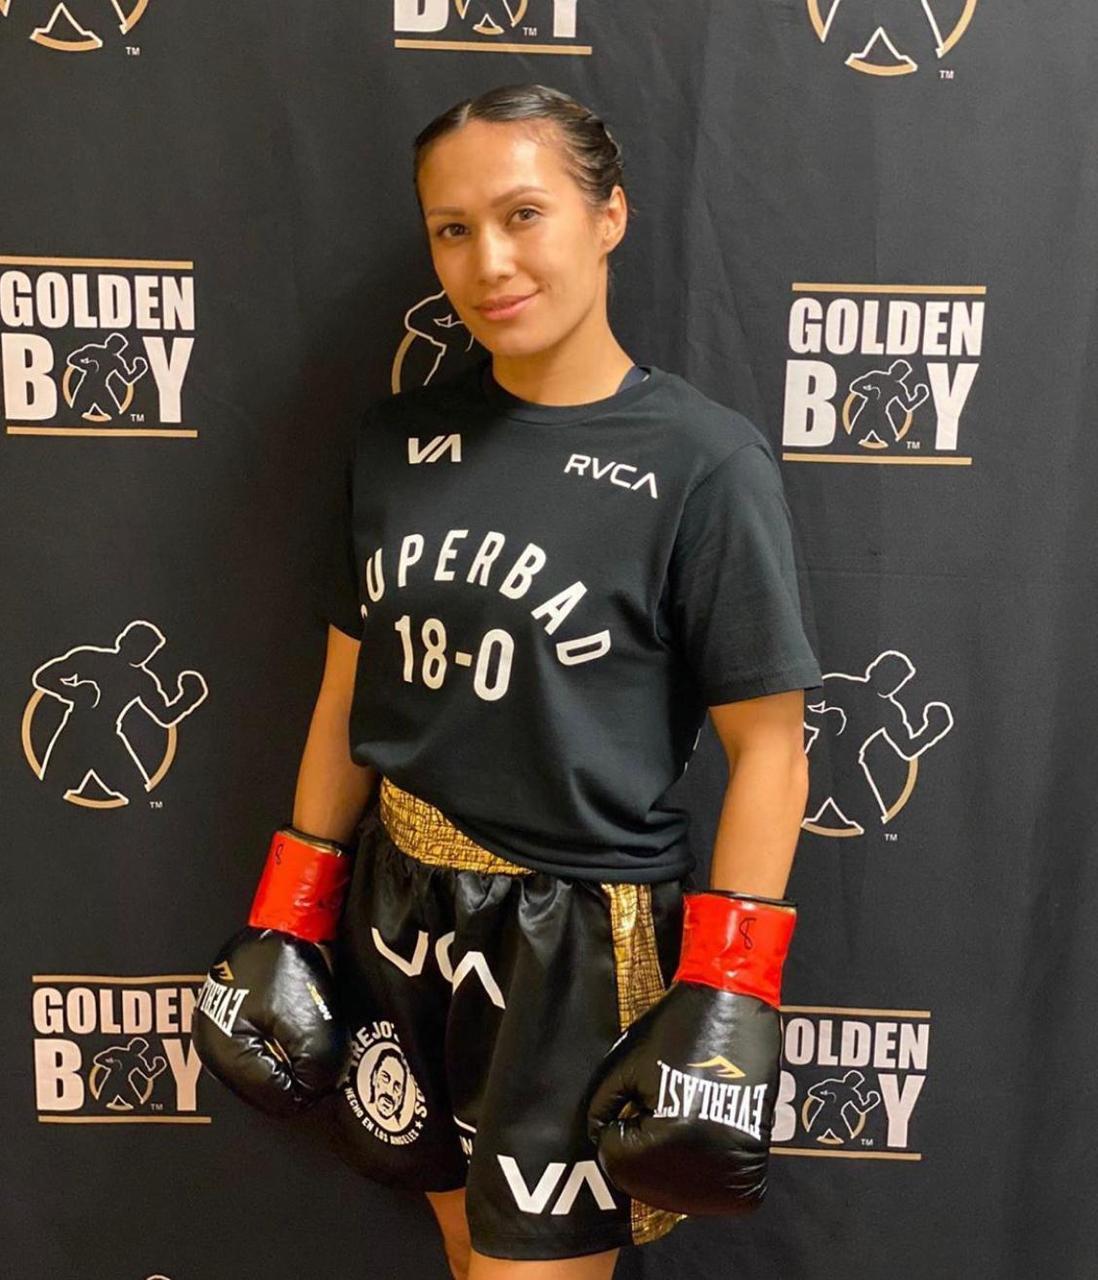 Seniesa Estrada swept away Adkins in Indio